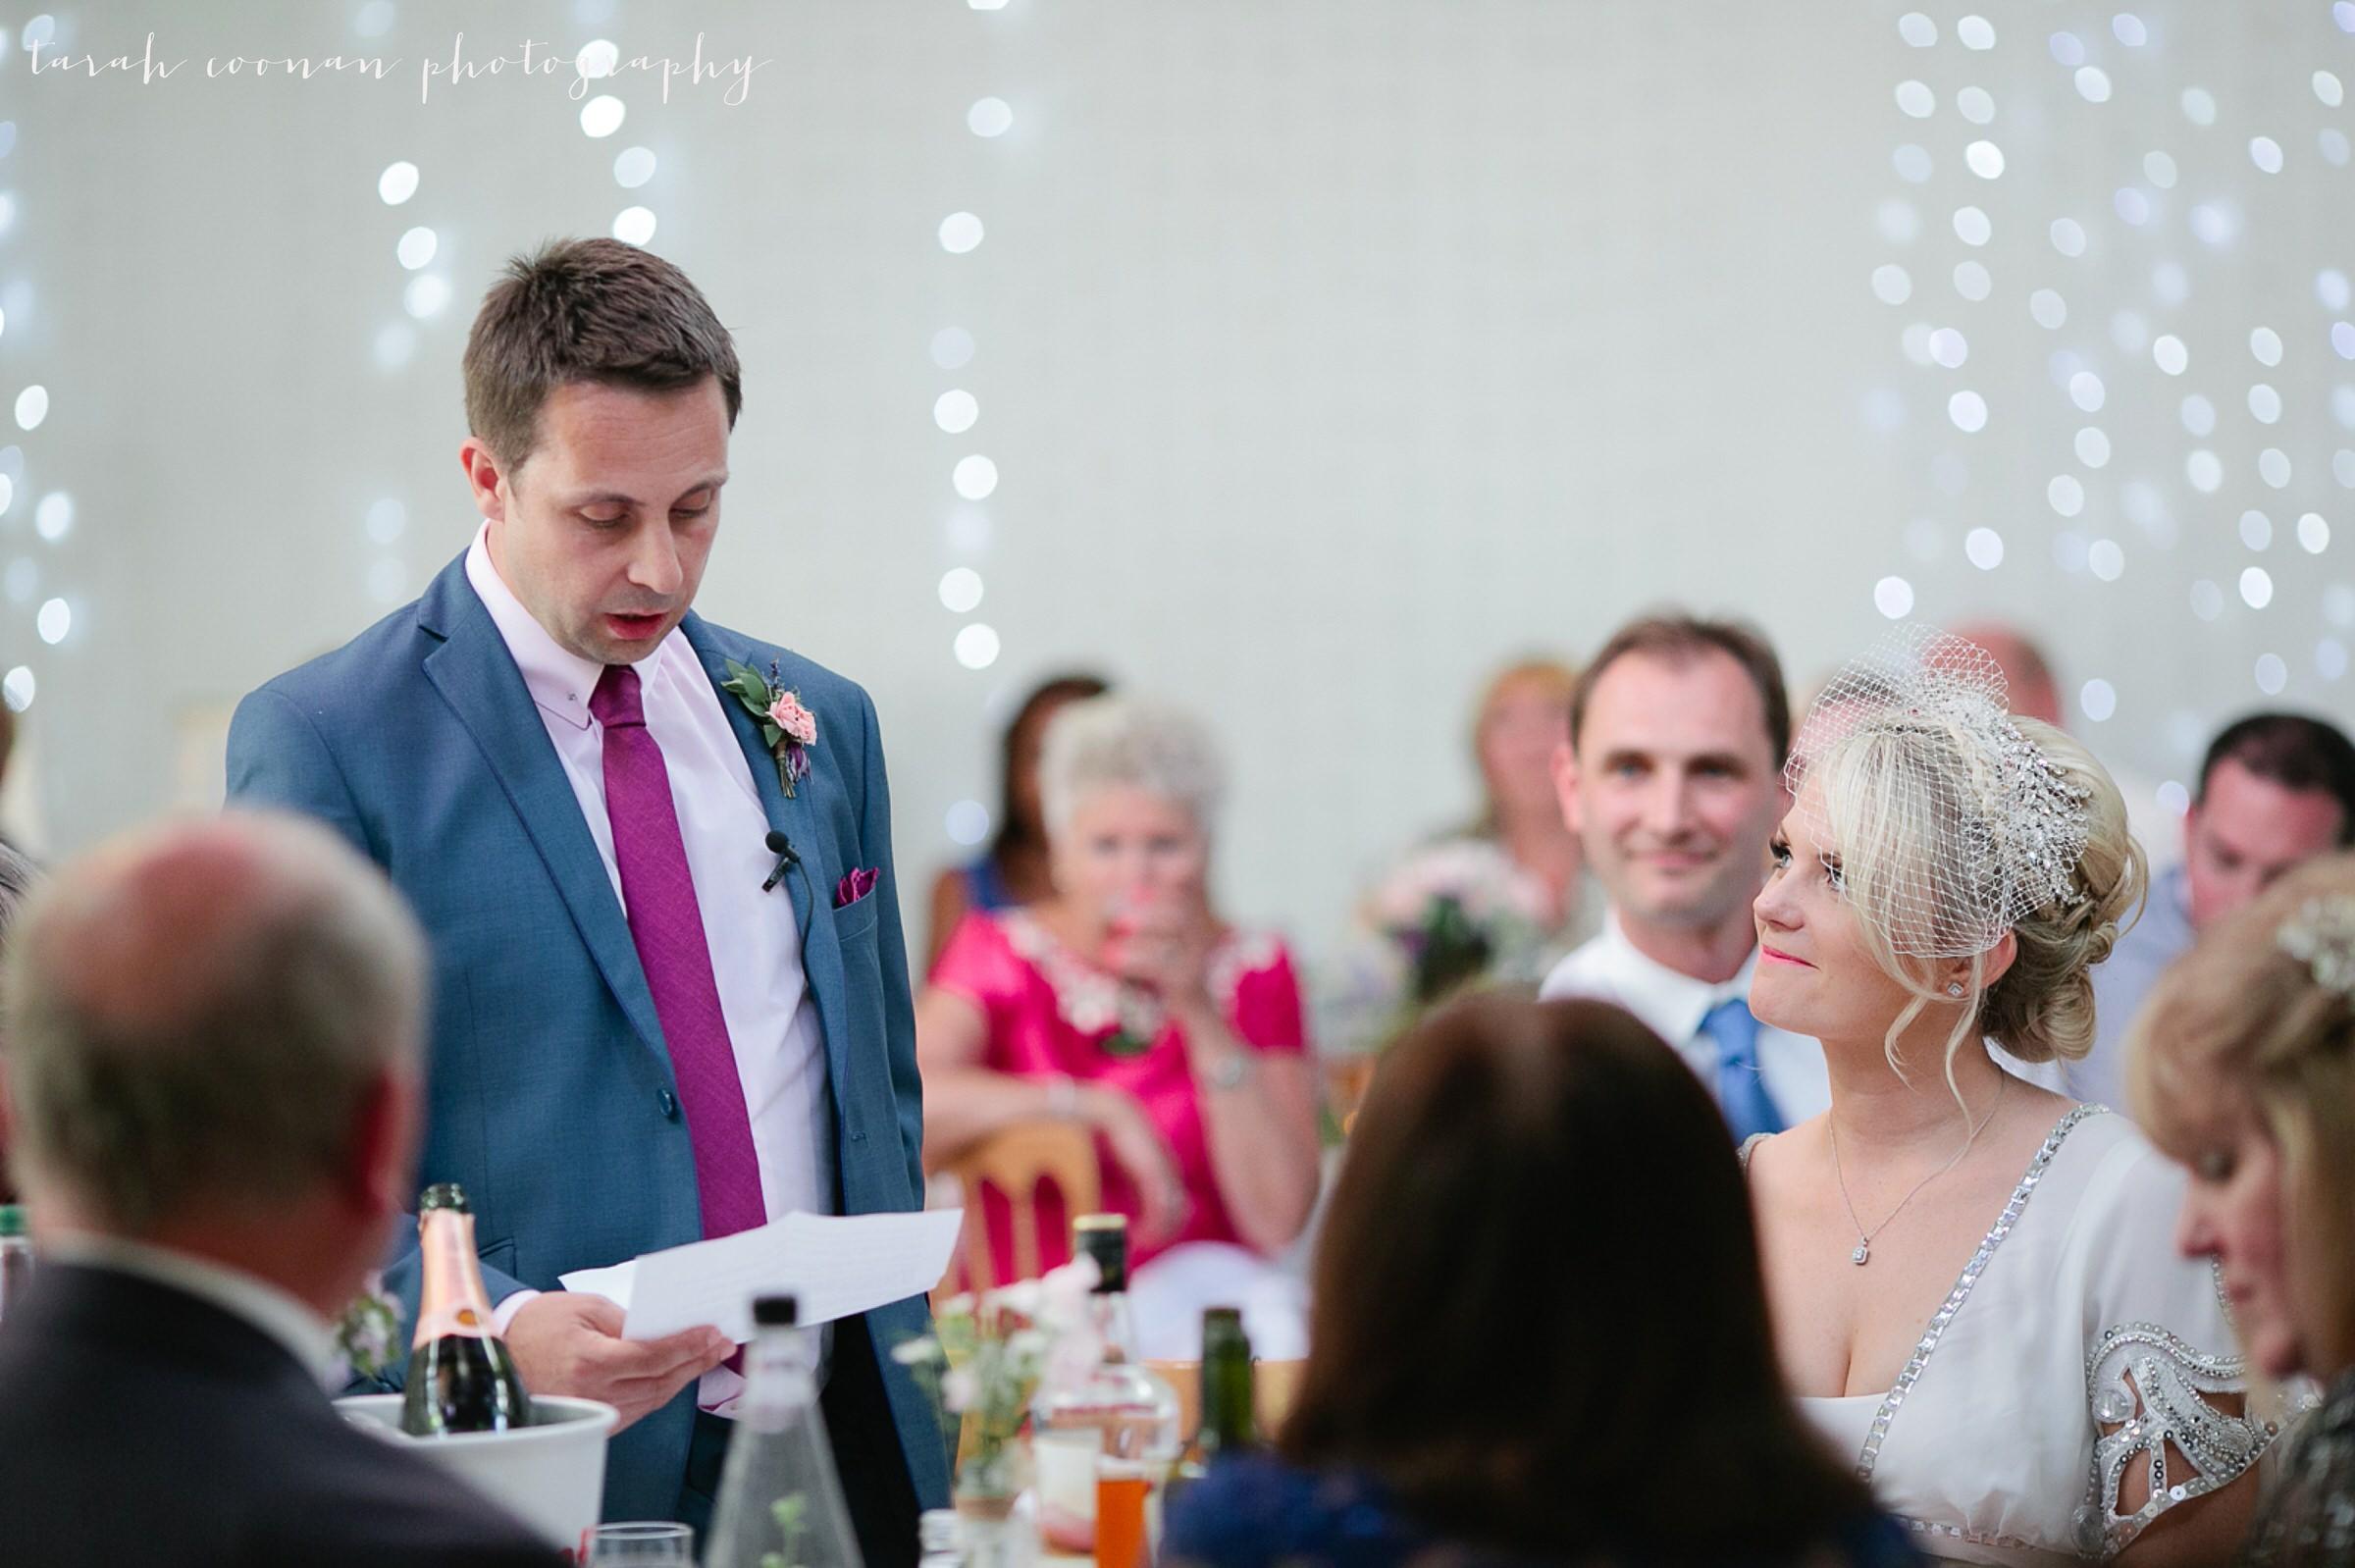 brighton-wedding-photographer79